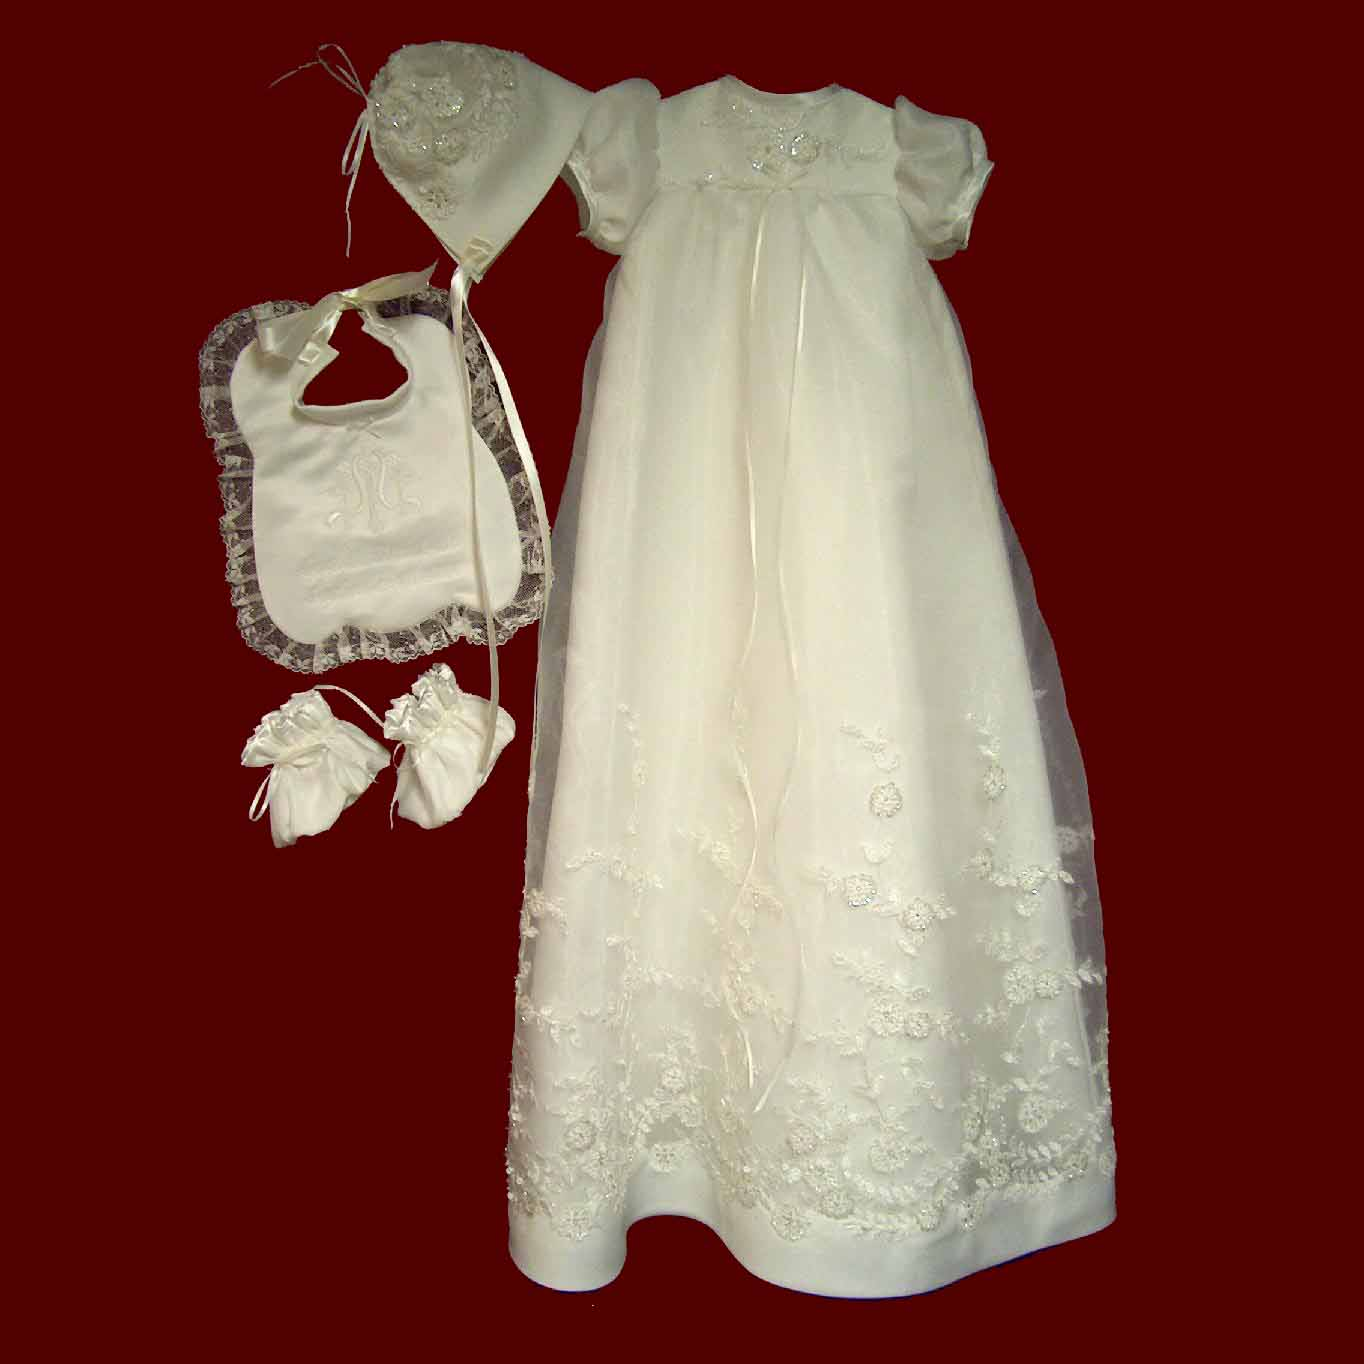 Christening Gown Made From Your Wedding Dress - Irish Girls ...